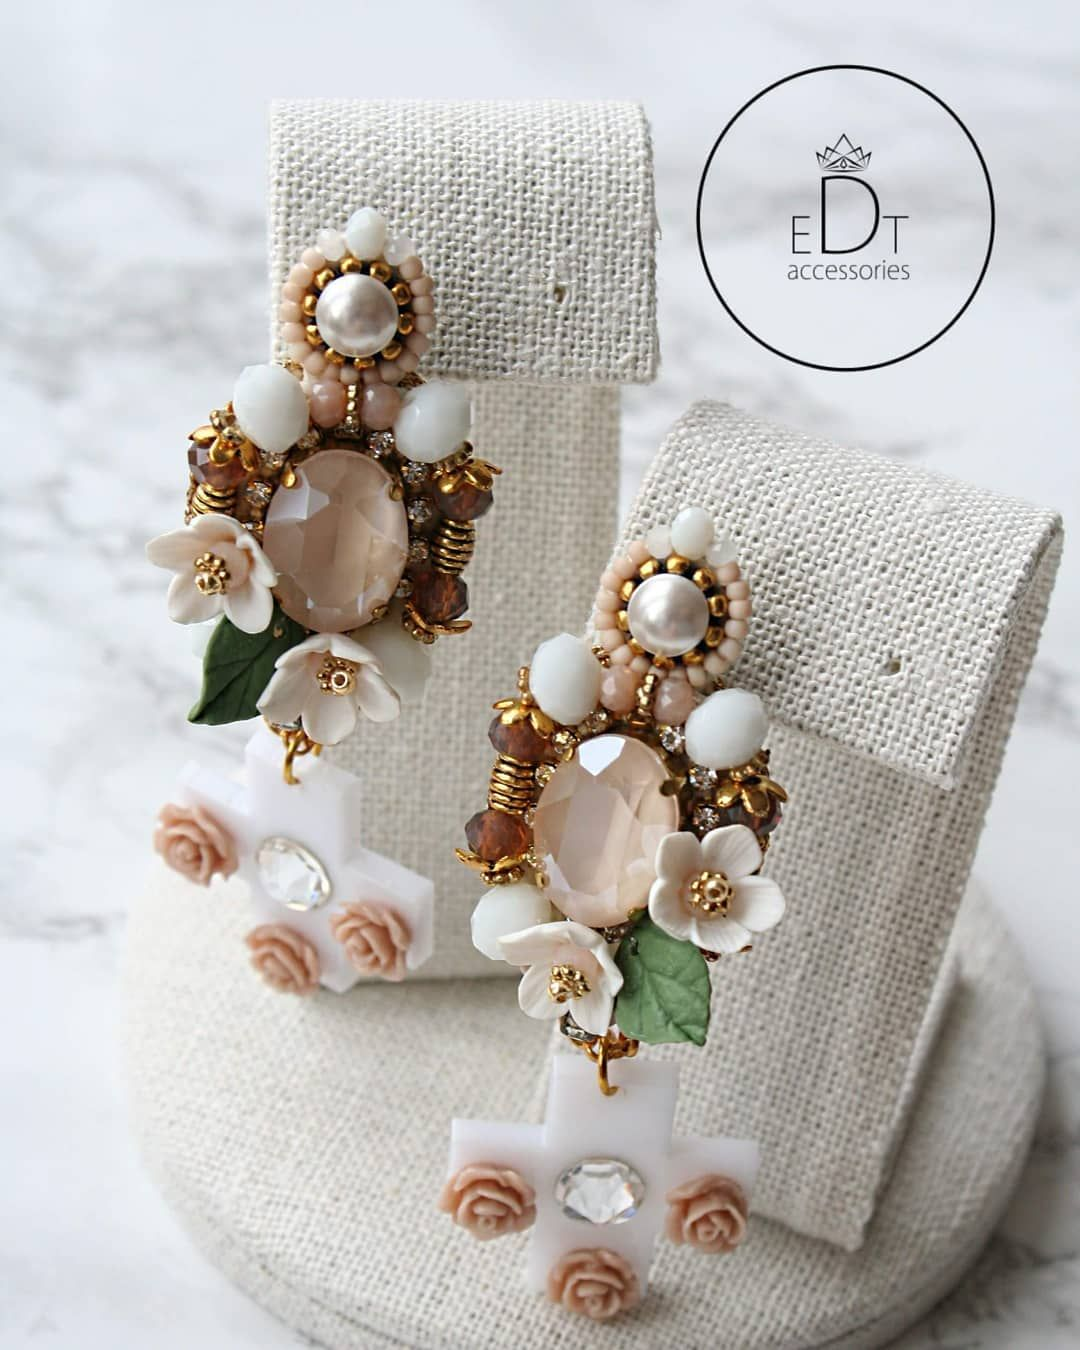 Earrings #earringsoftheday #handmadejewelry #handmade